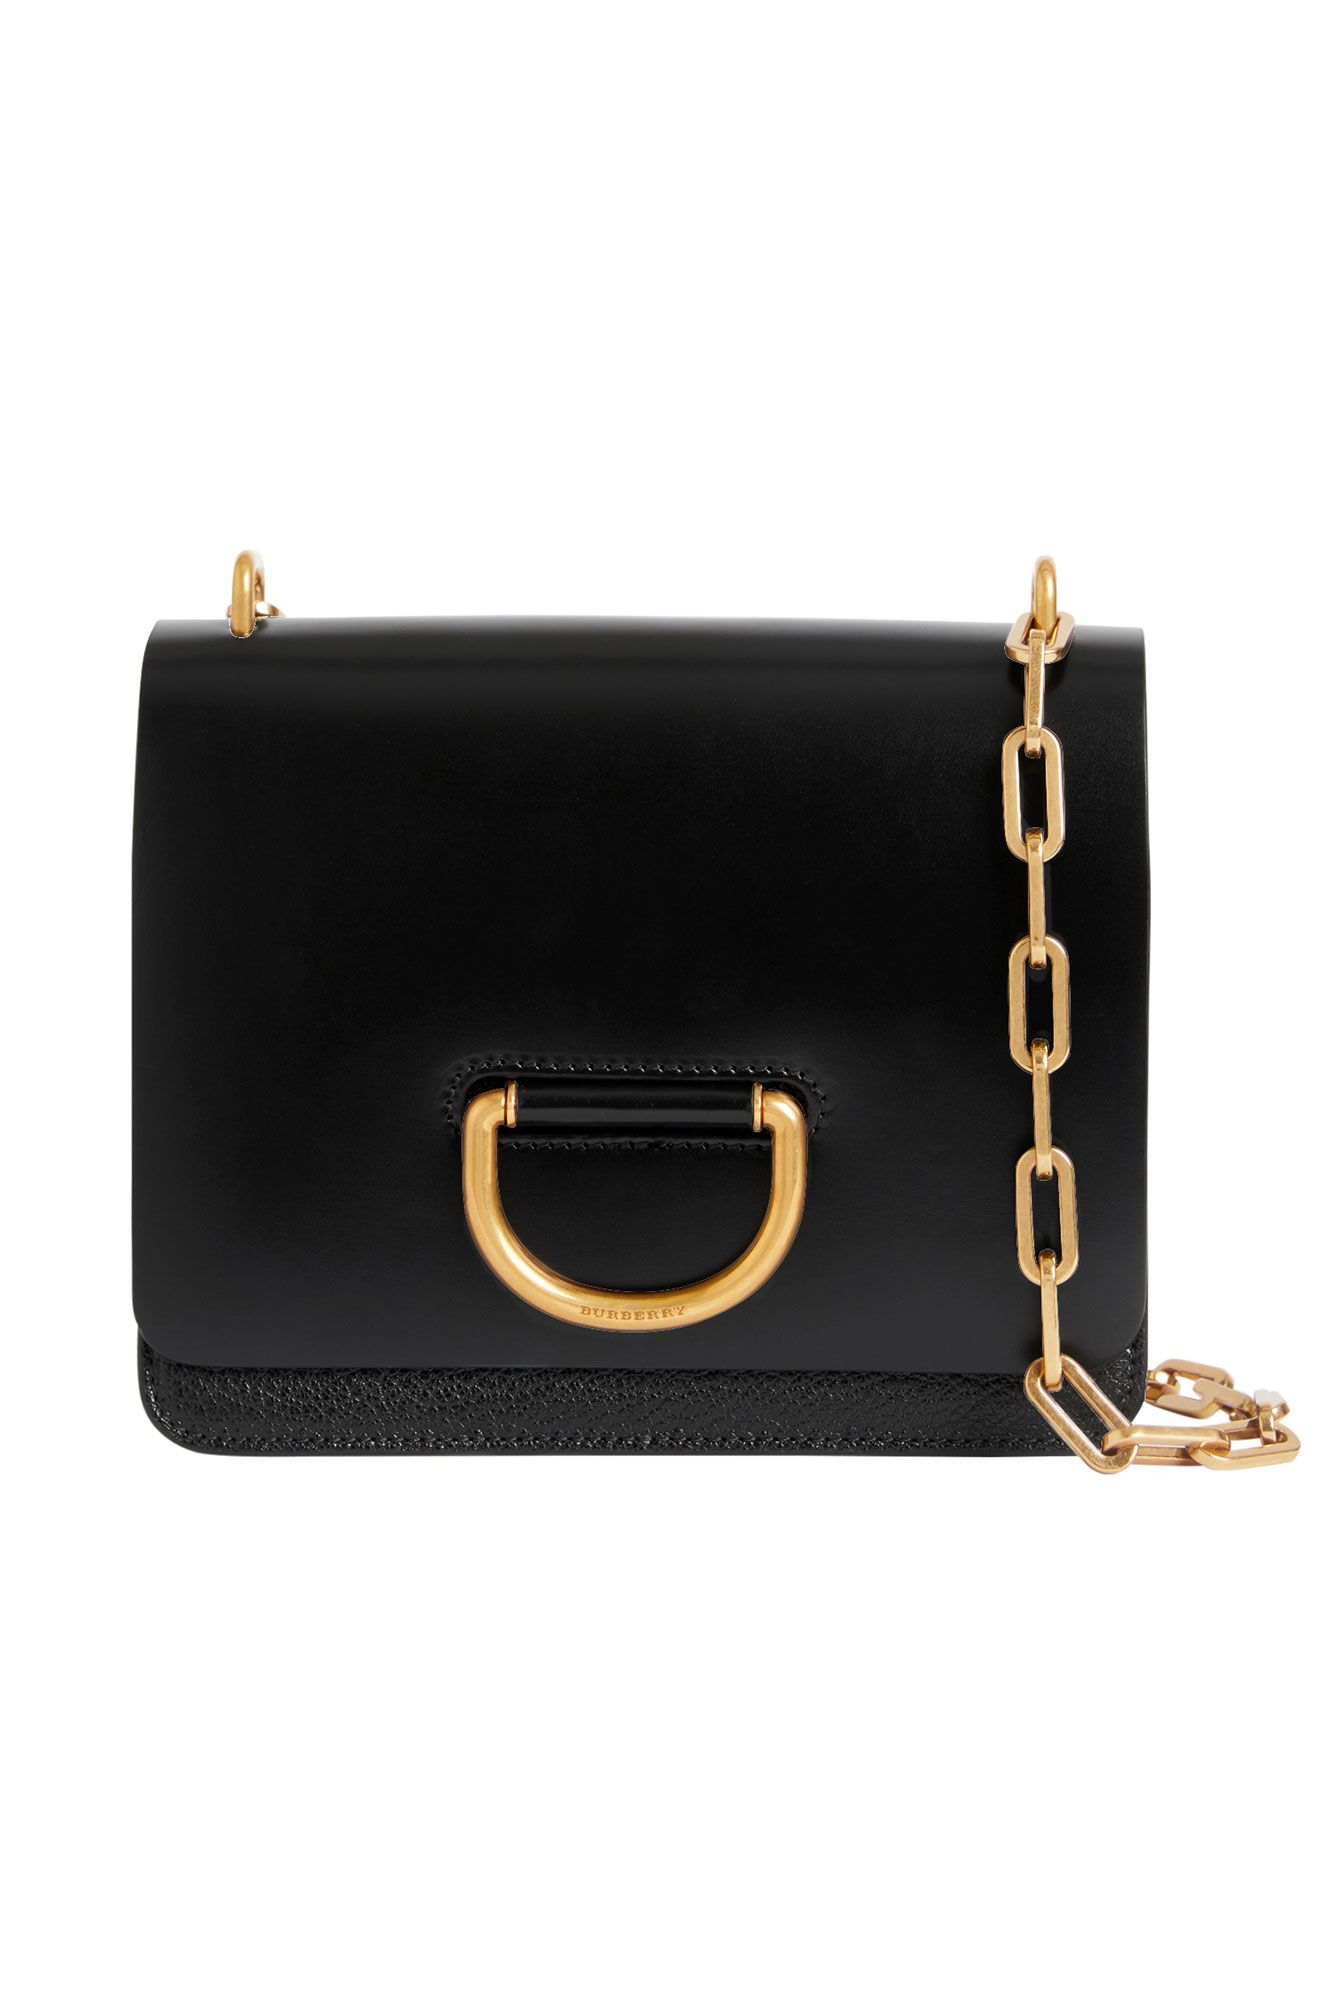 Burberry D-ring bag